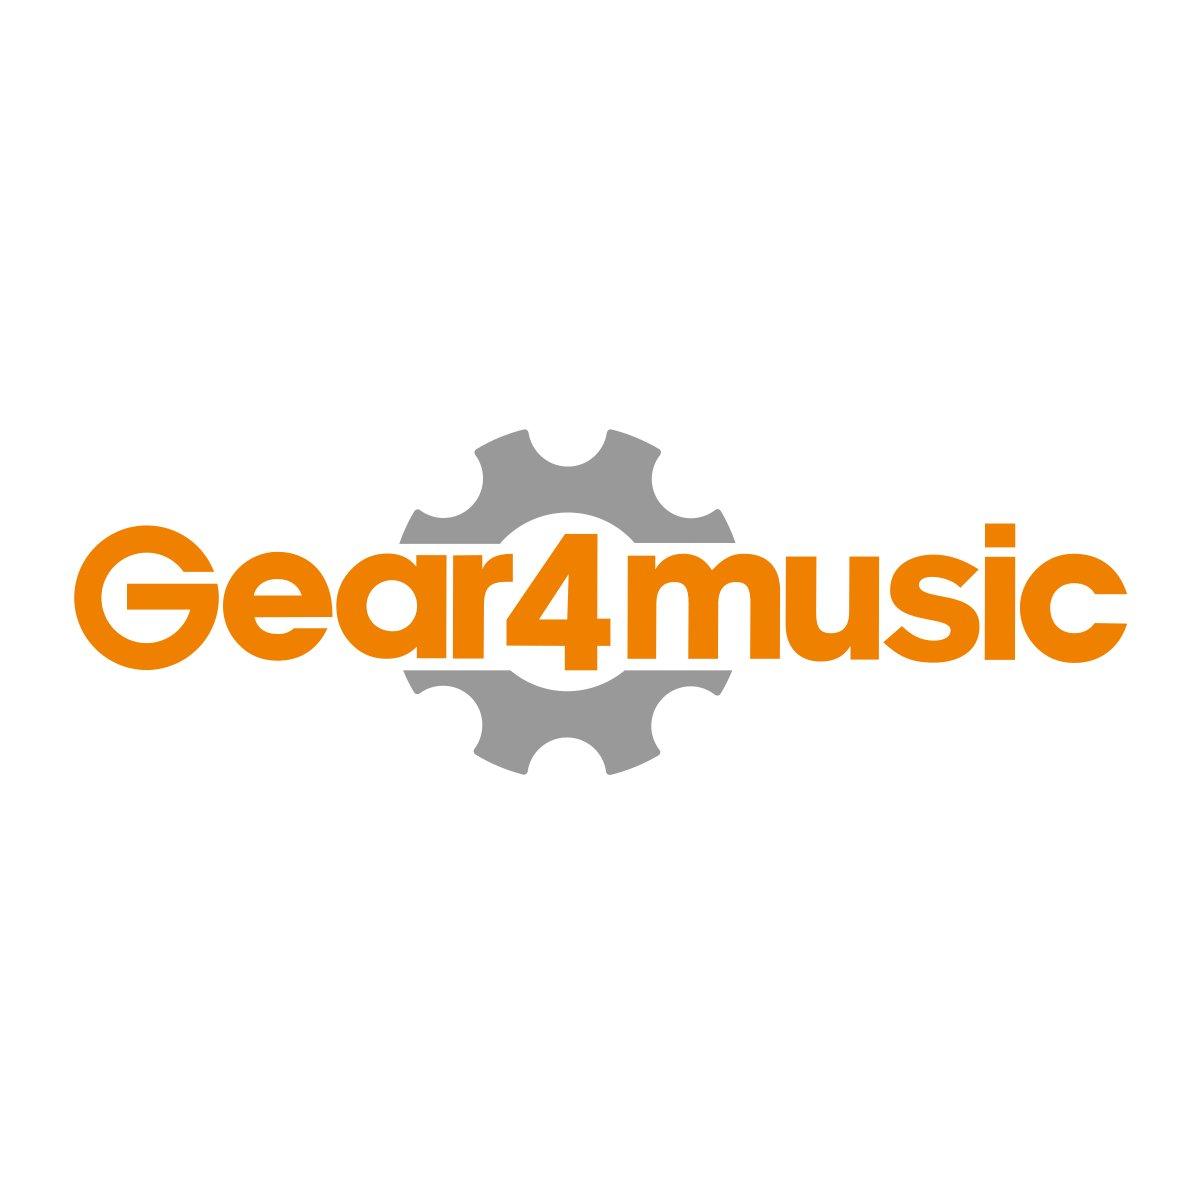 evans eq3 clear bass drum head 24 inch at gear4music. Black Bedroom Furniture Sets. Home Design Ideas